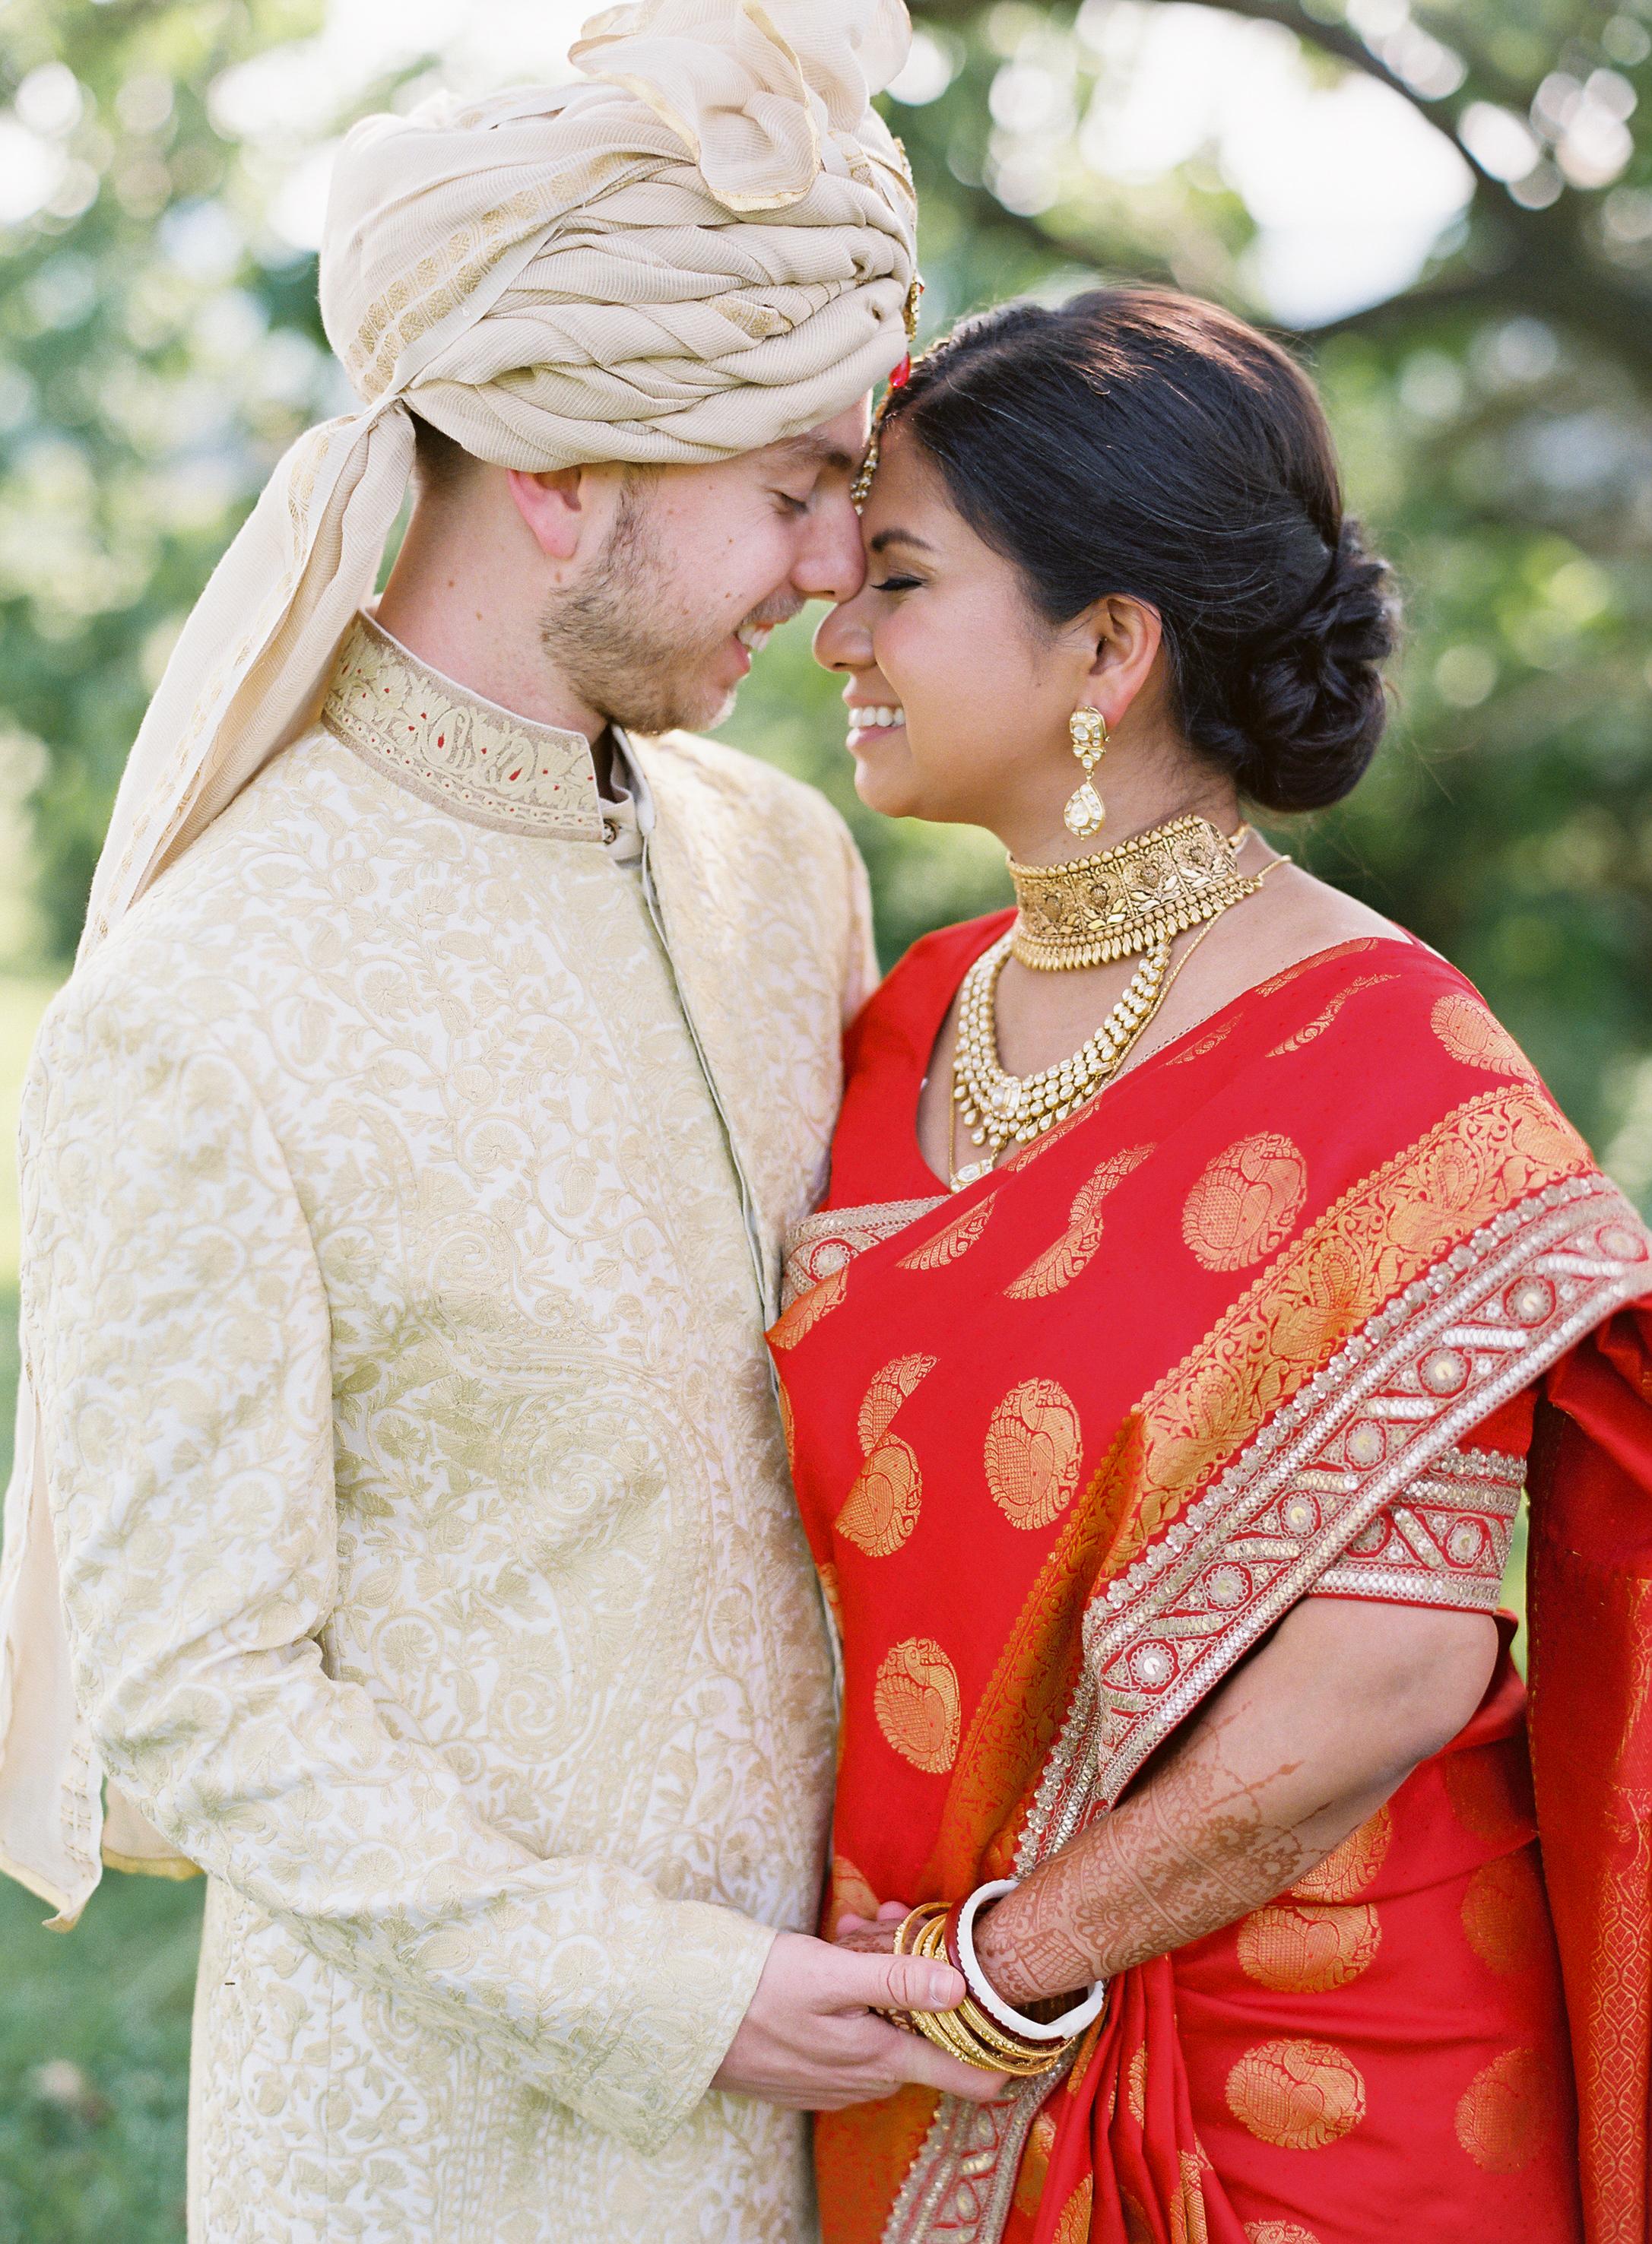 ronita ryan wedding couple first look